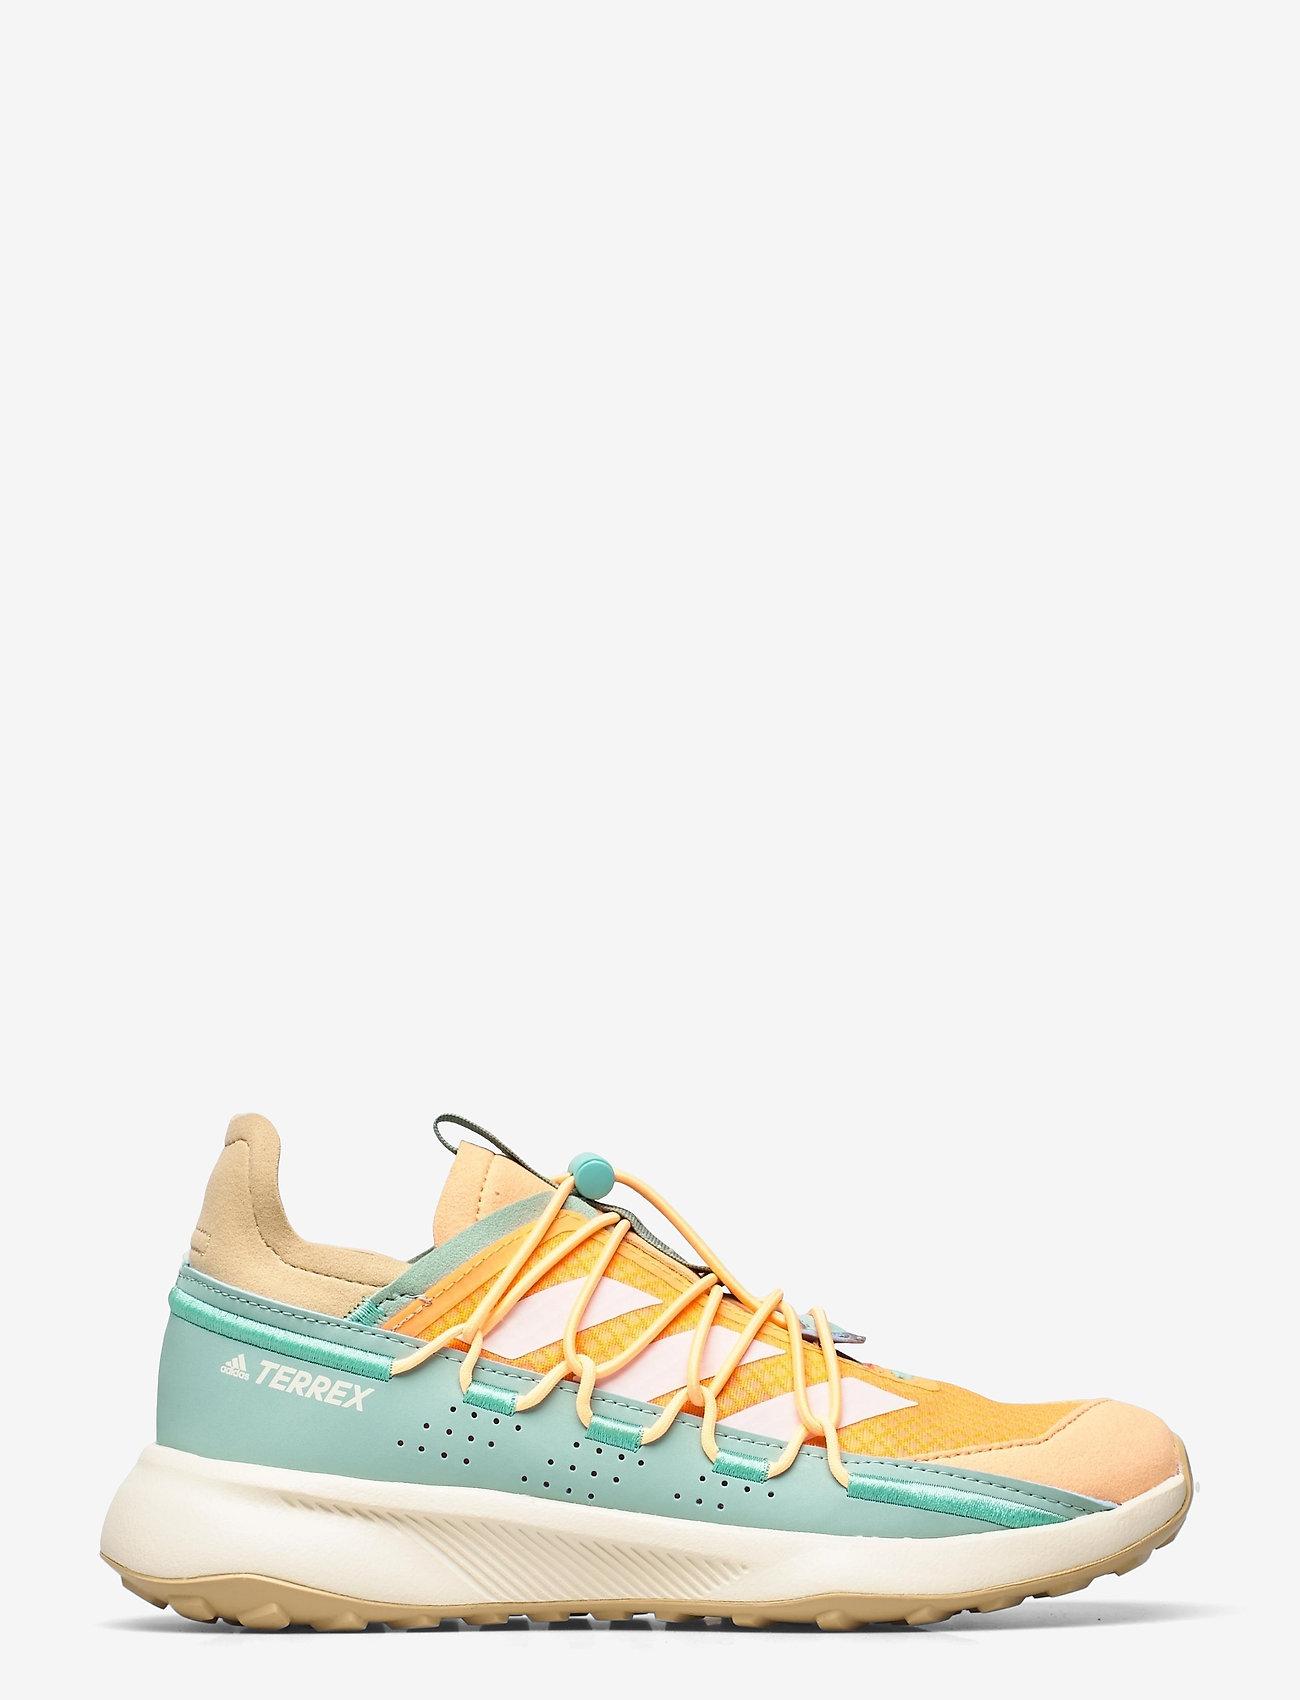 adidas Performance - Terrex Voyager 21 Travel  W - running shoes - scrora/cwhite/hazgrn - 1